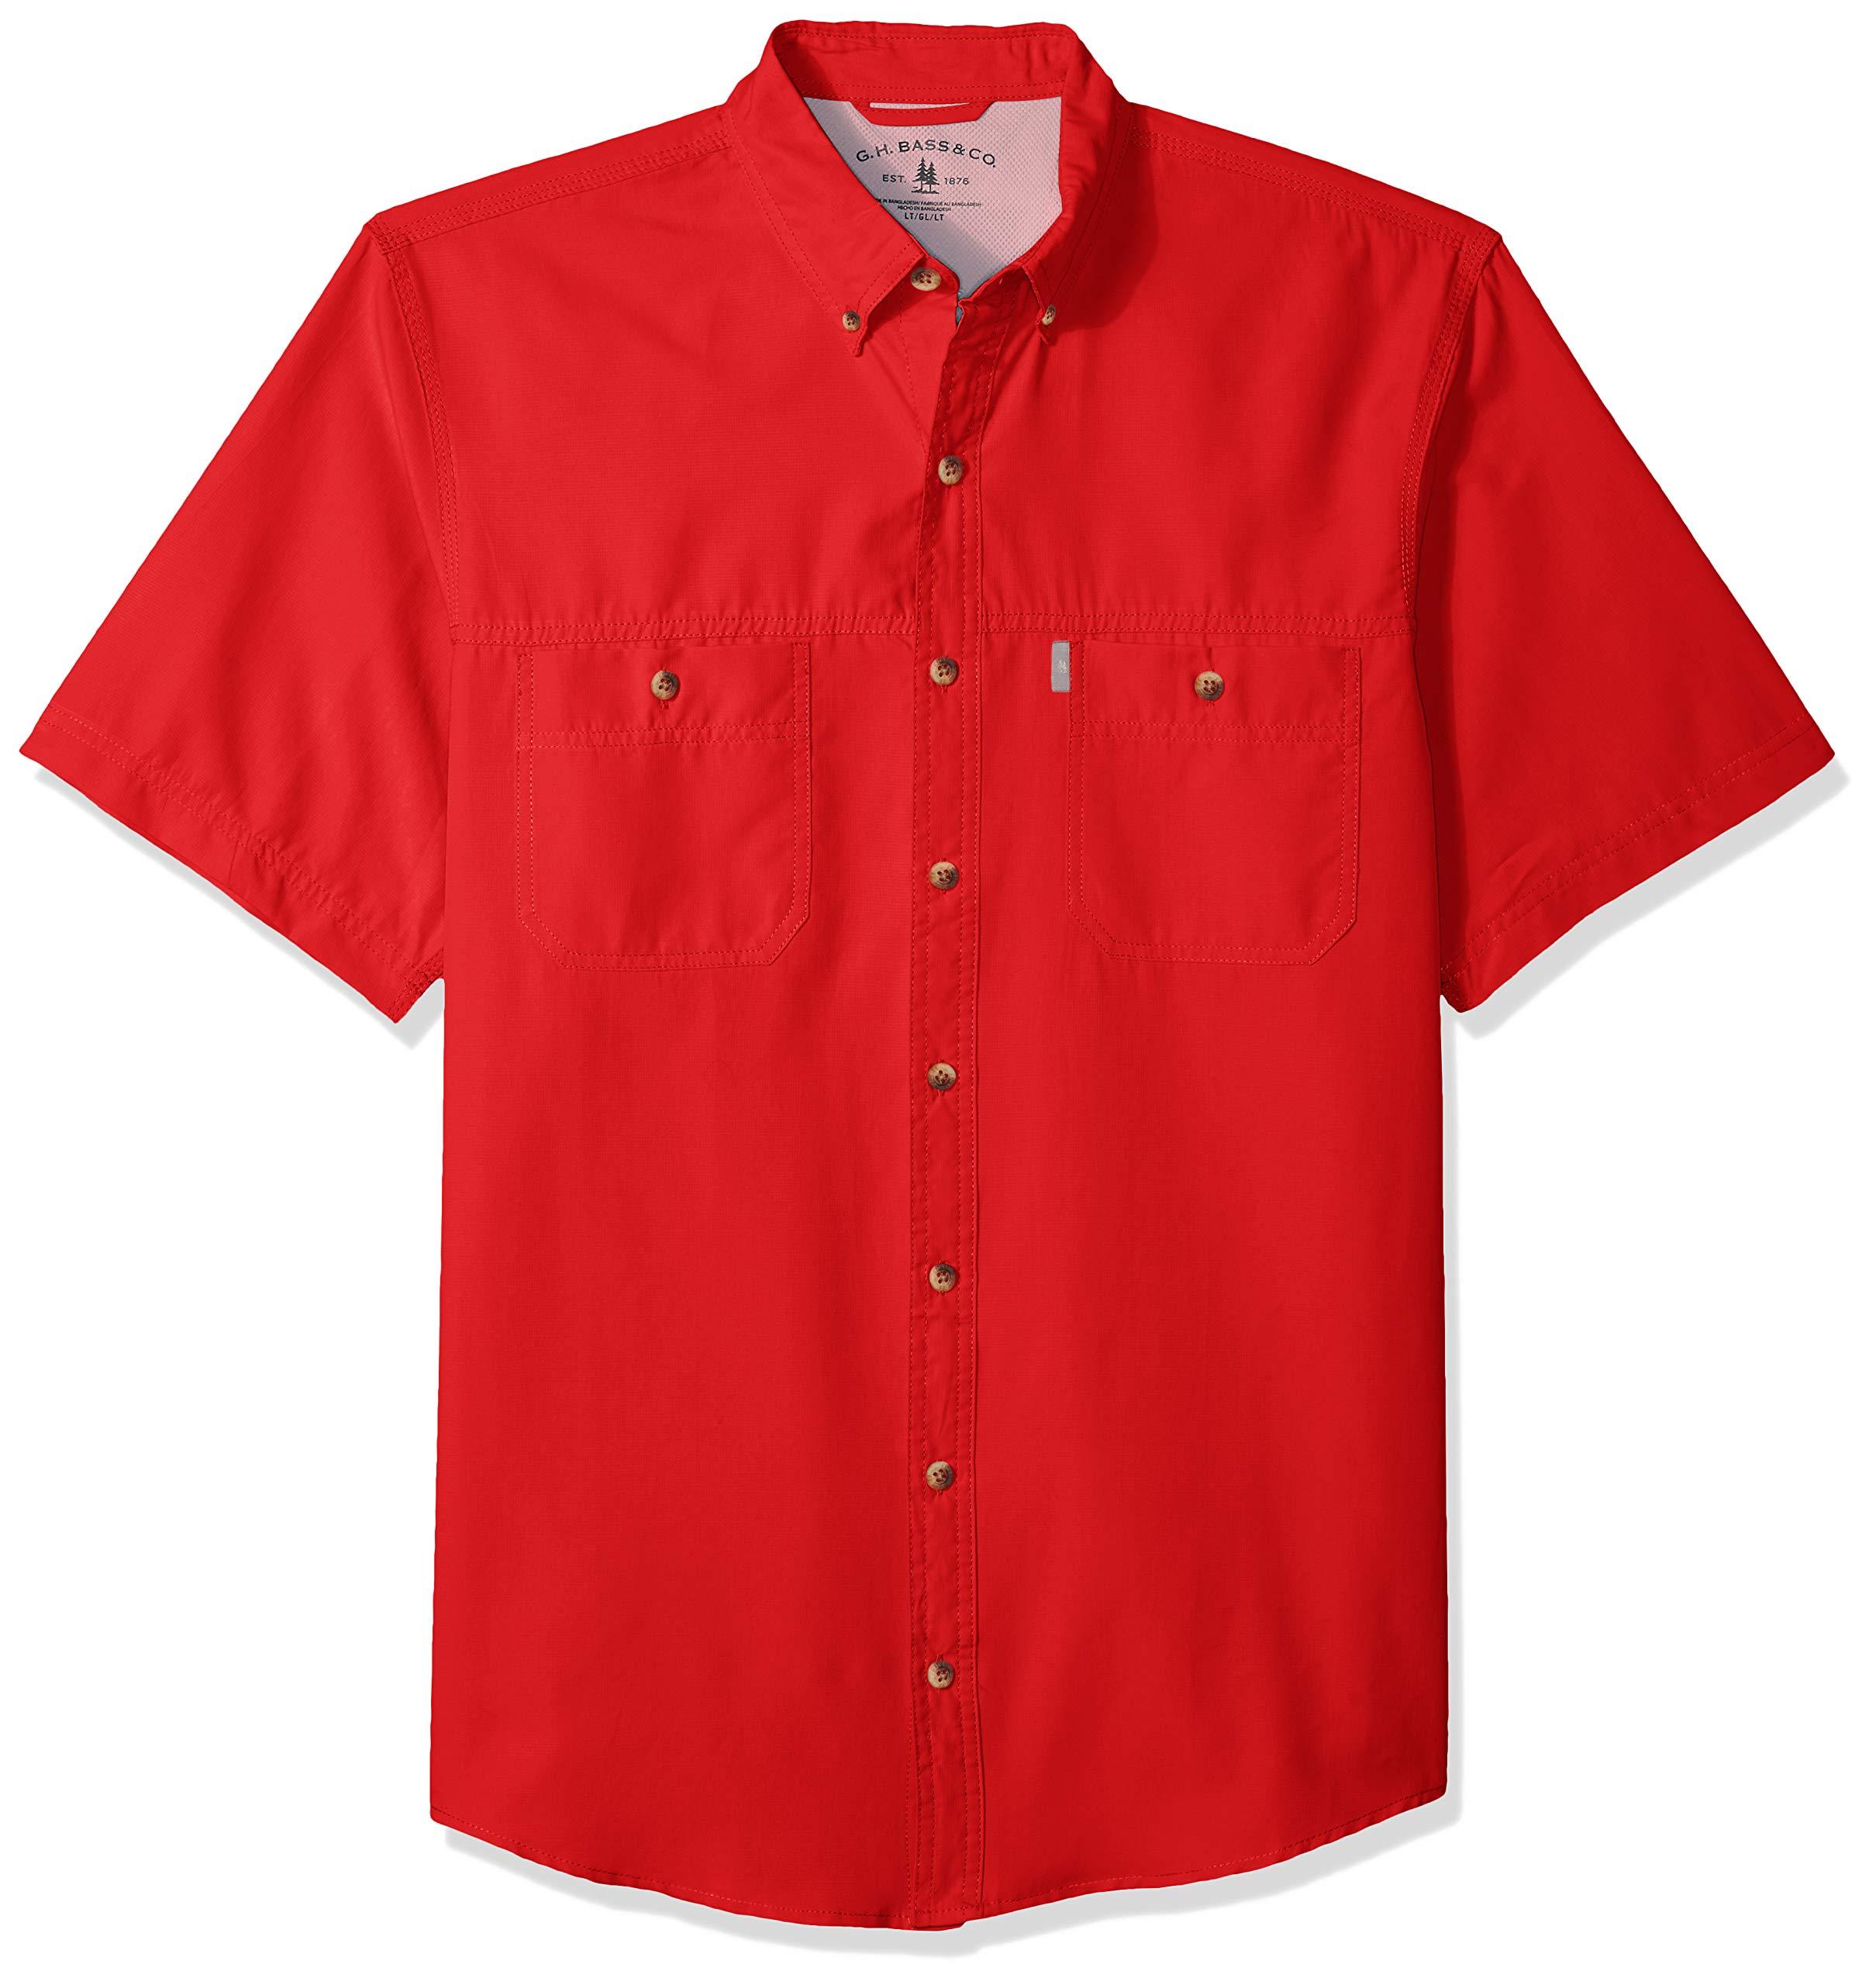 G.H. Bass & Co. Men's Big and Tall Explorer Short Sleeve Button Down Fishing Shirt,  mars red 1, 4X-Large Big